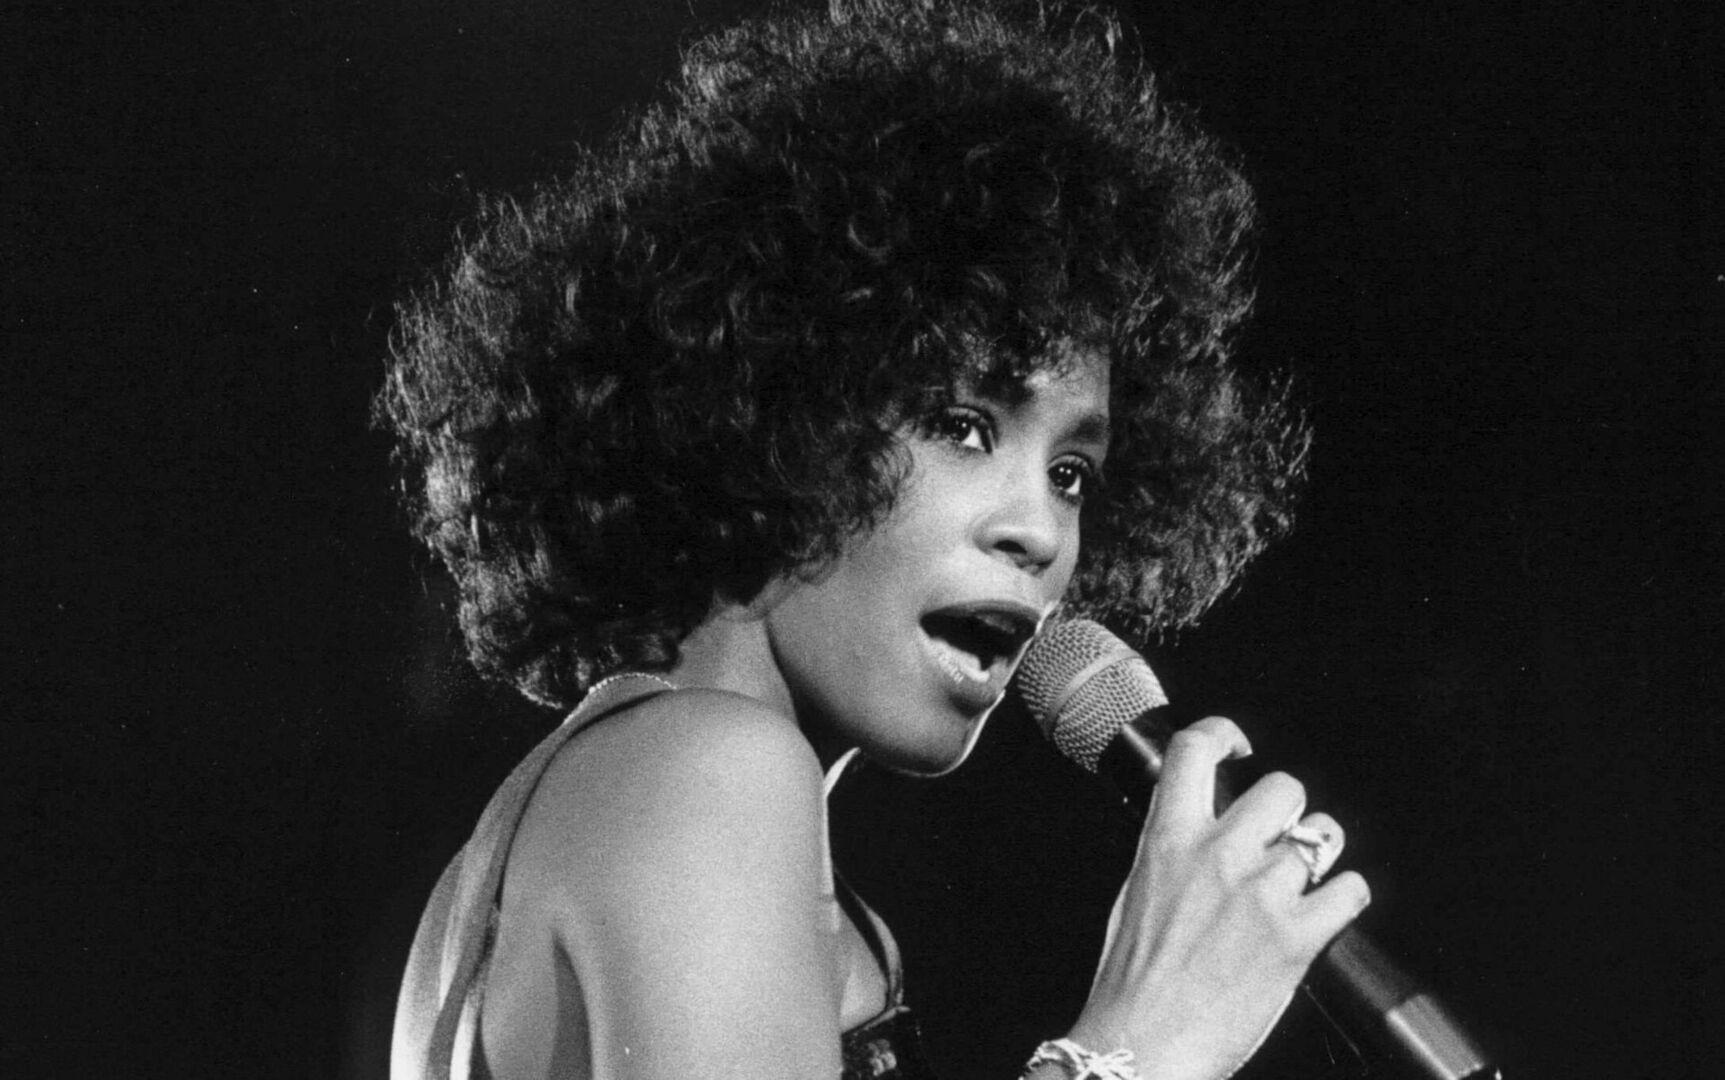 Whitney Houston murió devorada por las drogas de su exmarido - Chic